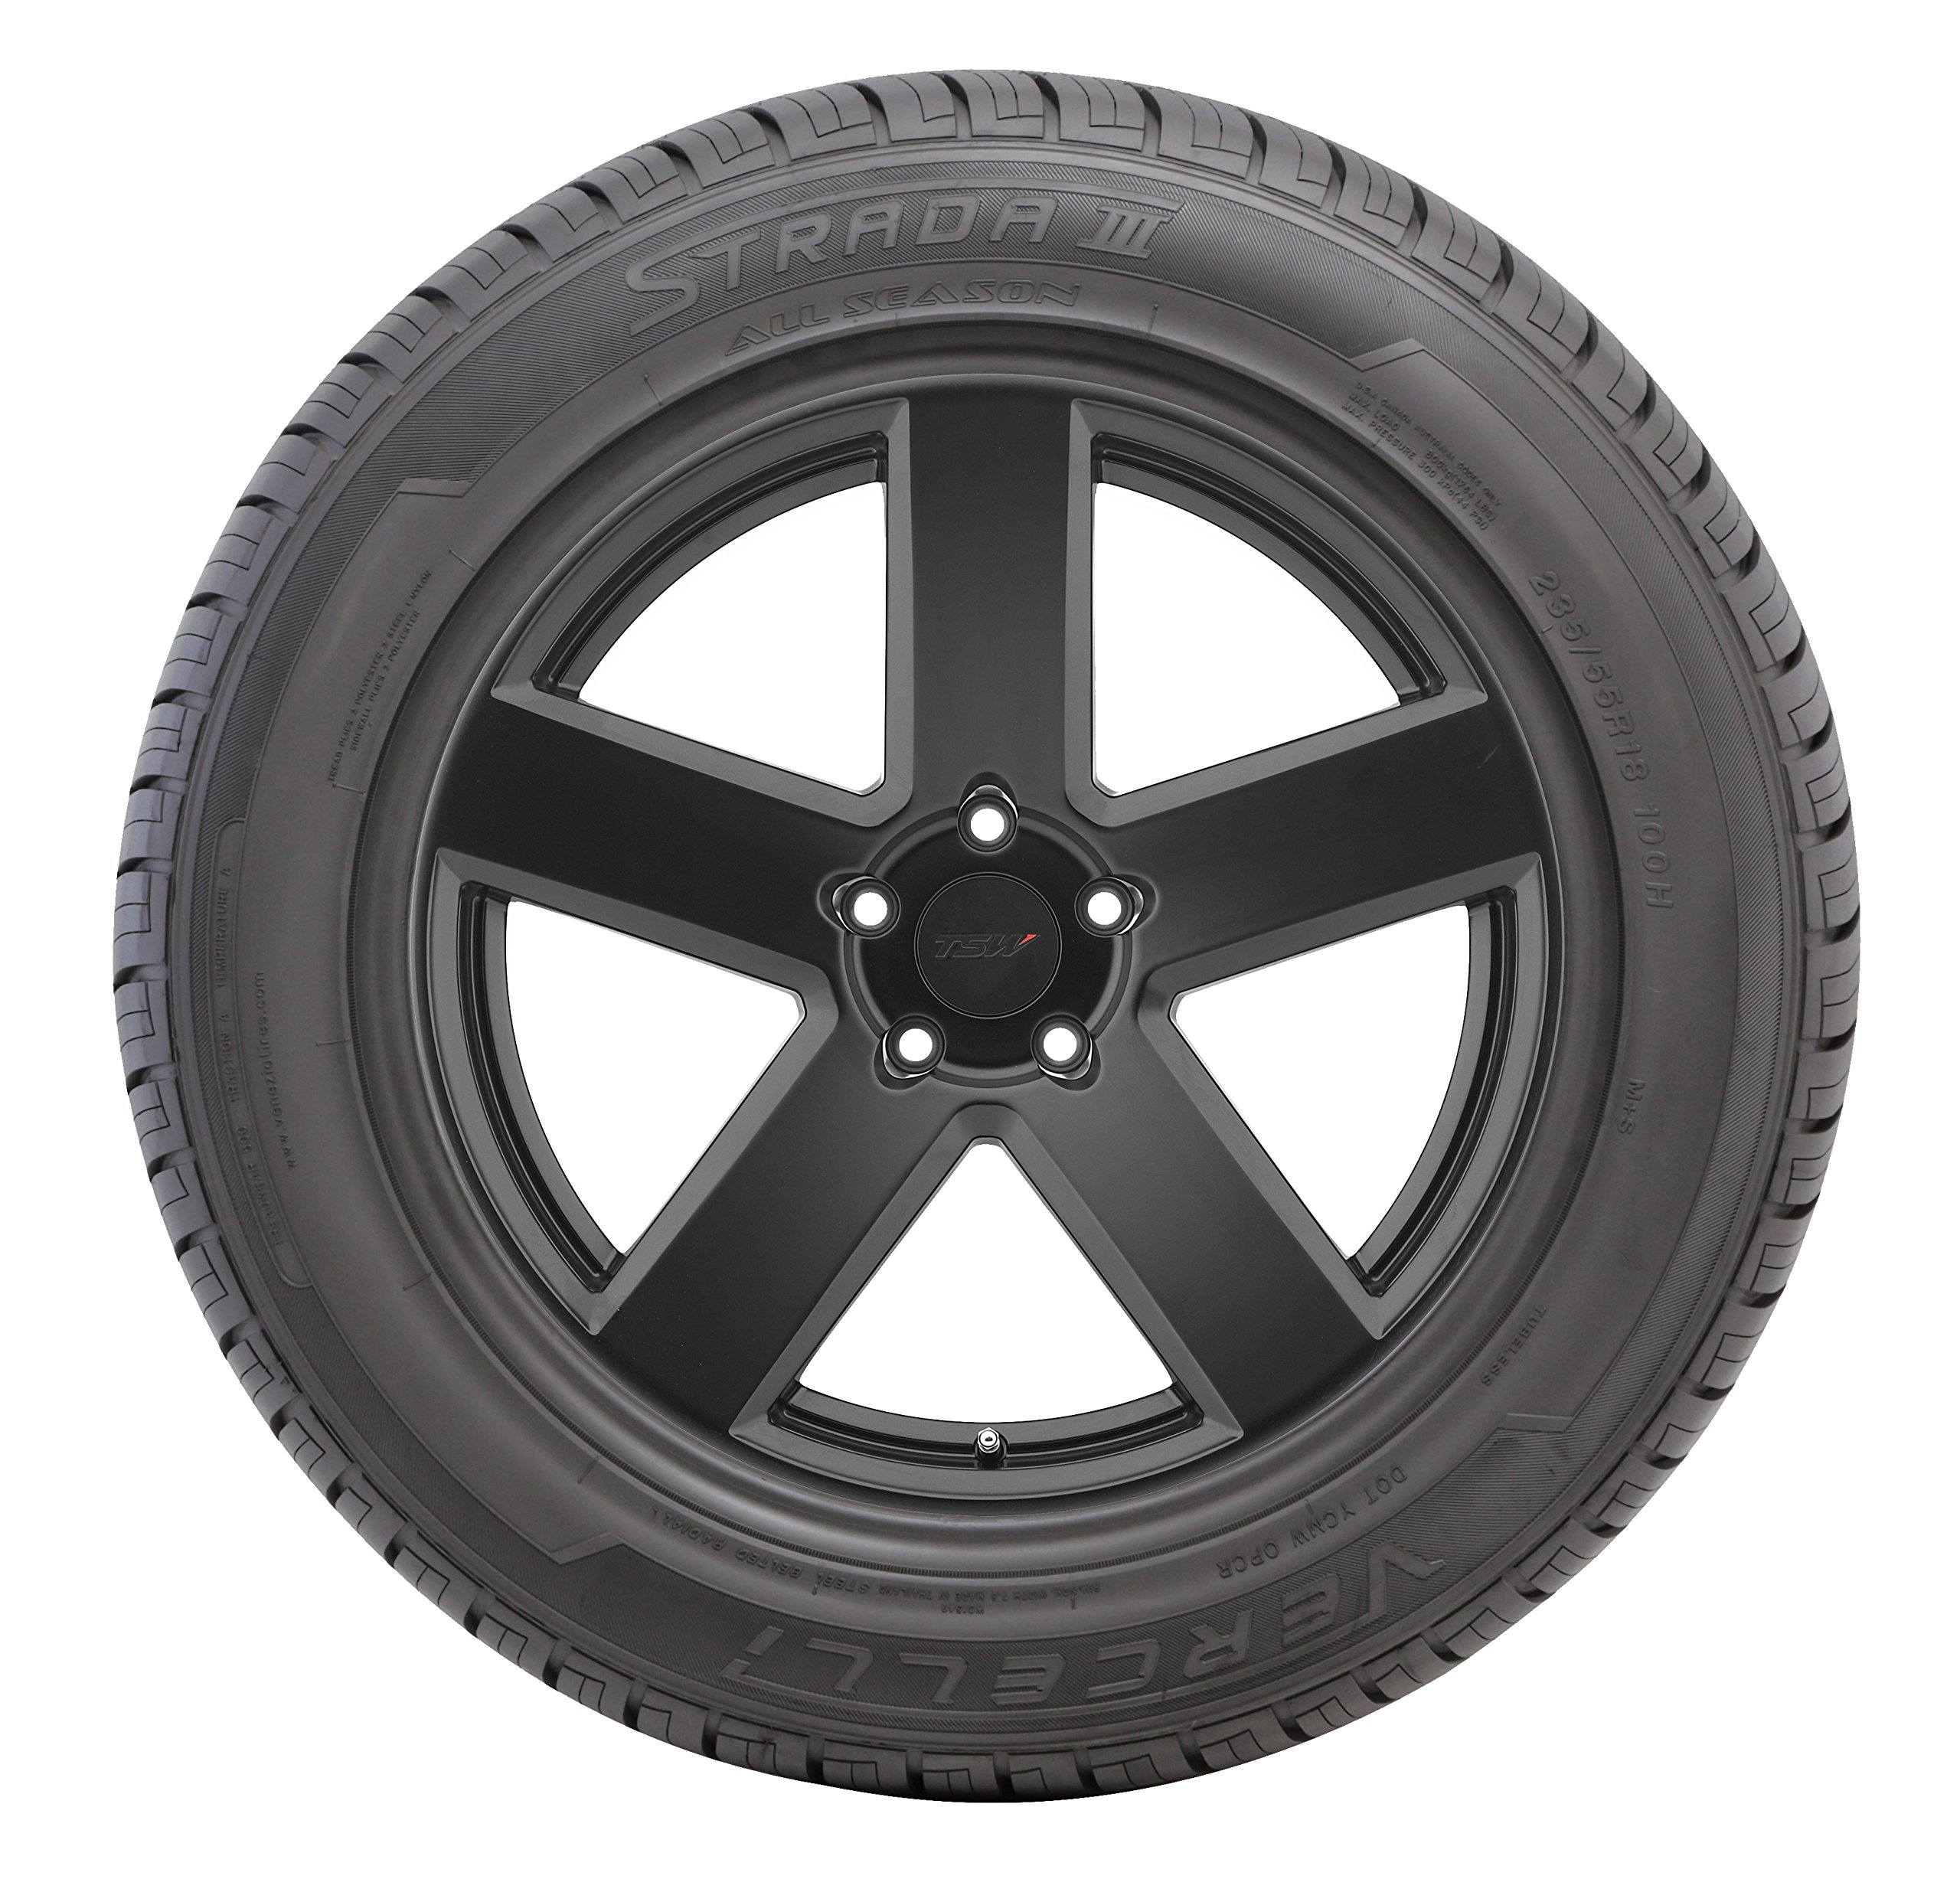 Vercelli Strada III All-Season Radial Tire - 235/55R18 100H by Vercelli (Image #4)